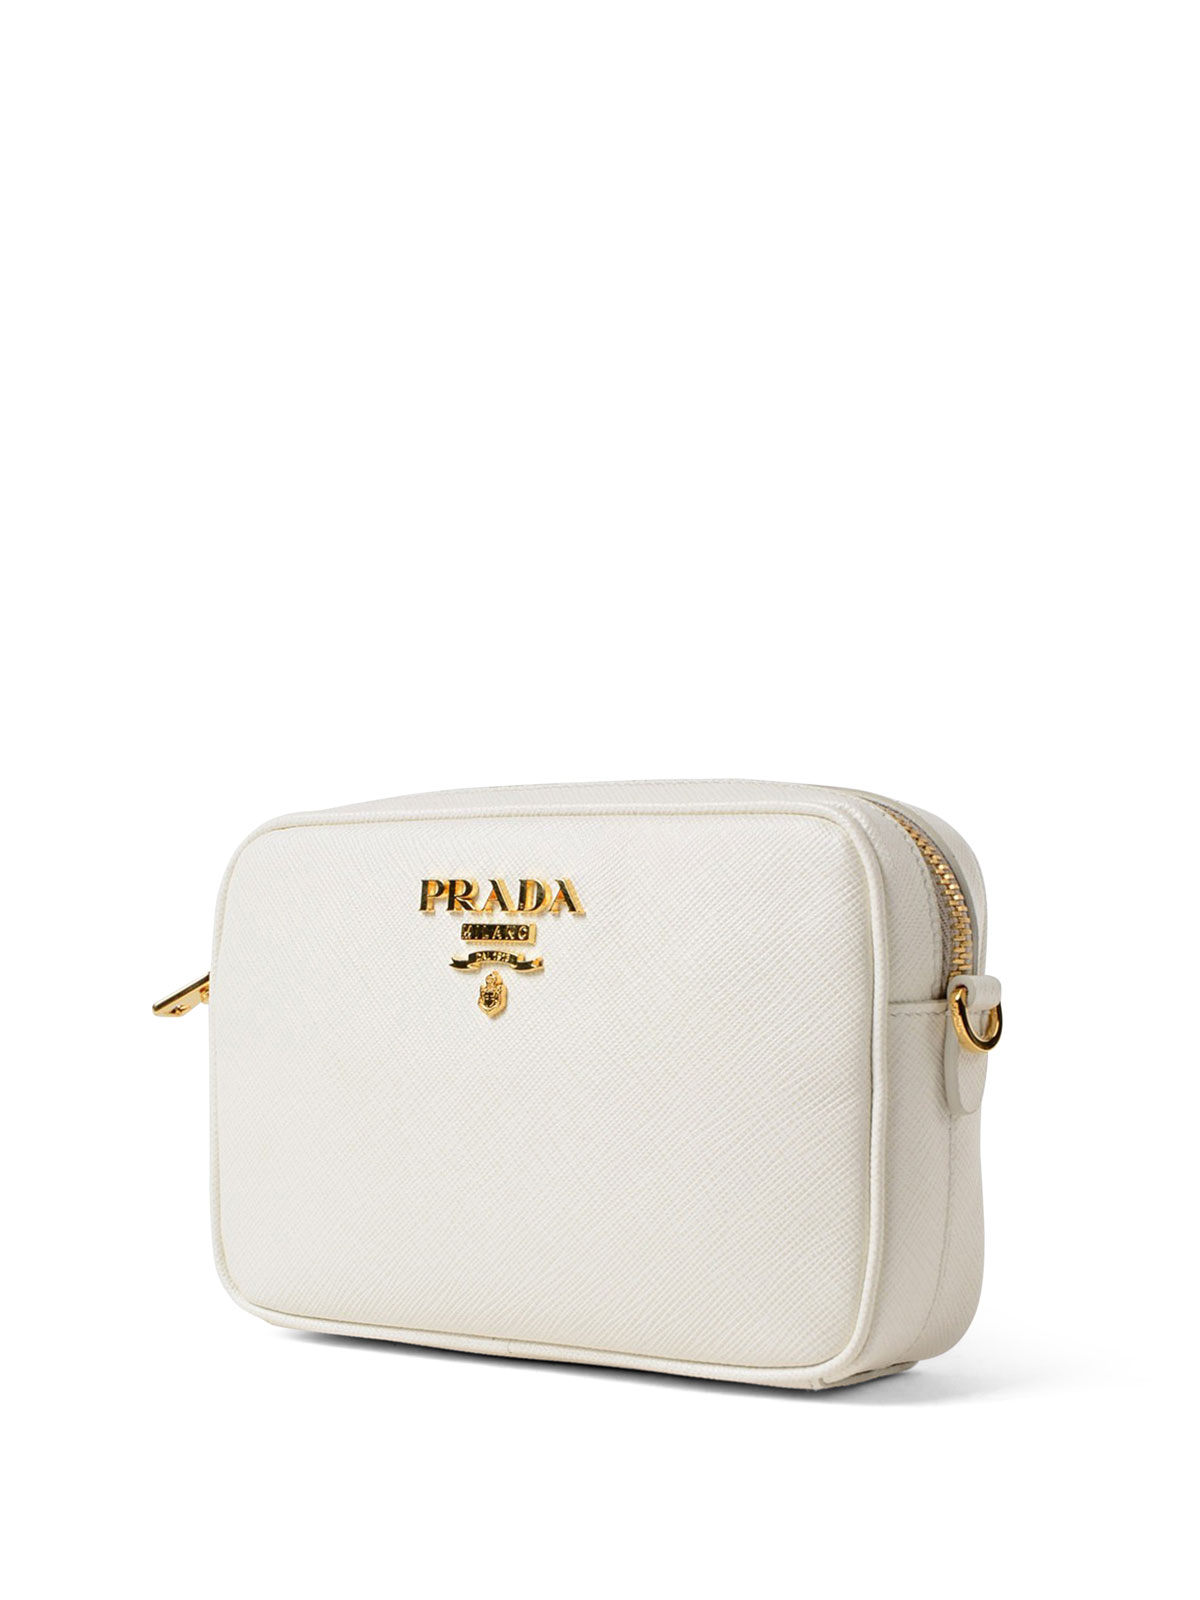 3a824ce5b17f0 PRADA: cross body bags online - White saffiano leather crossbody